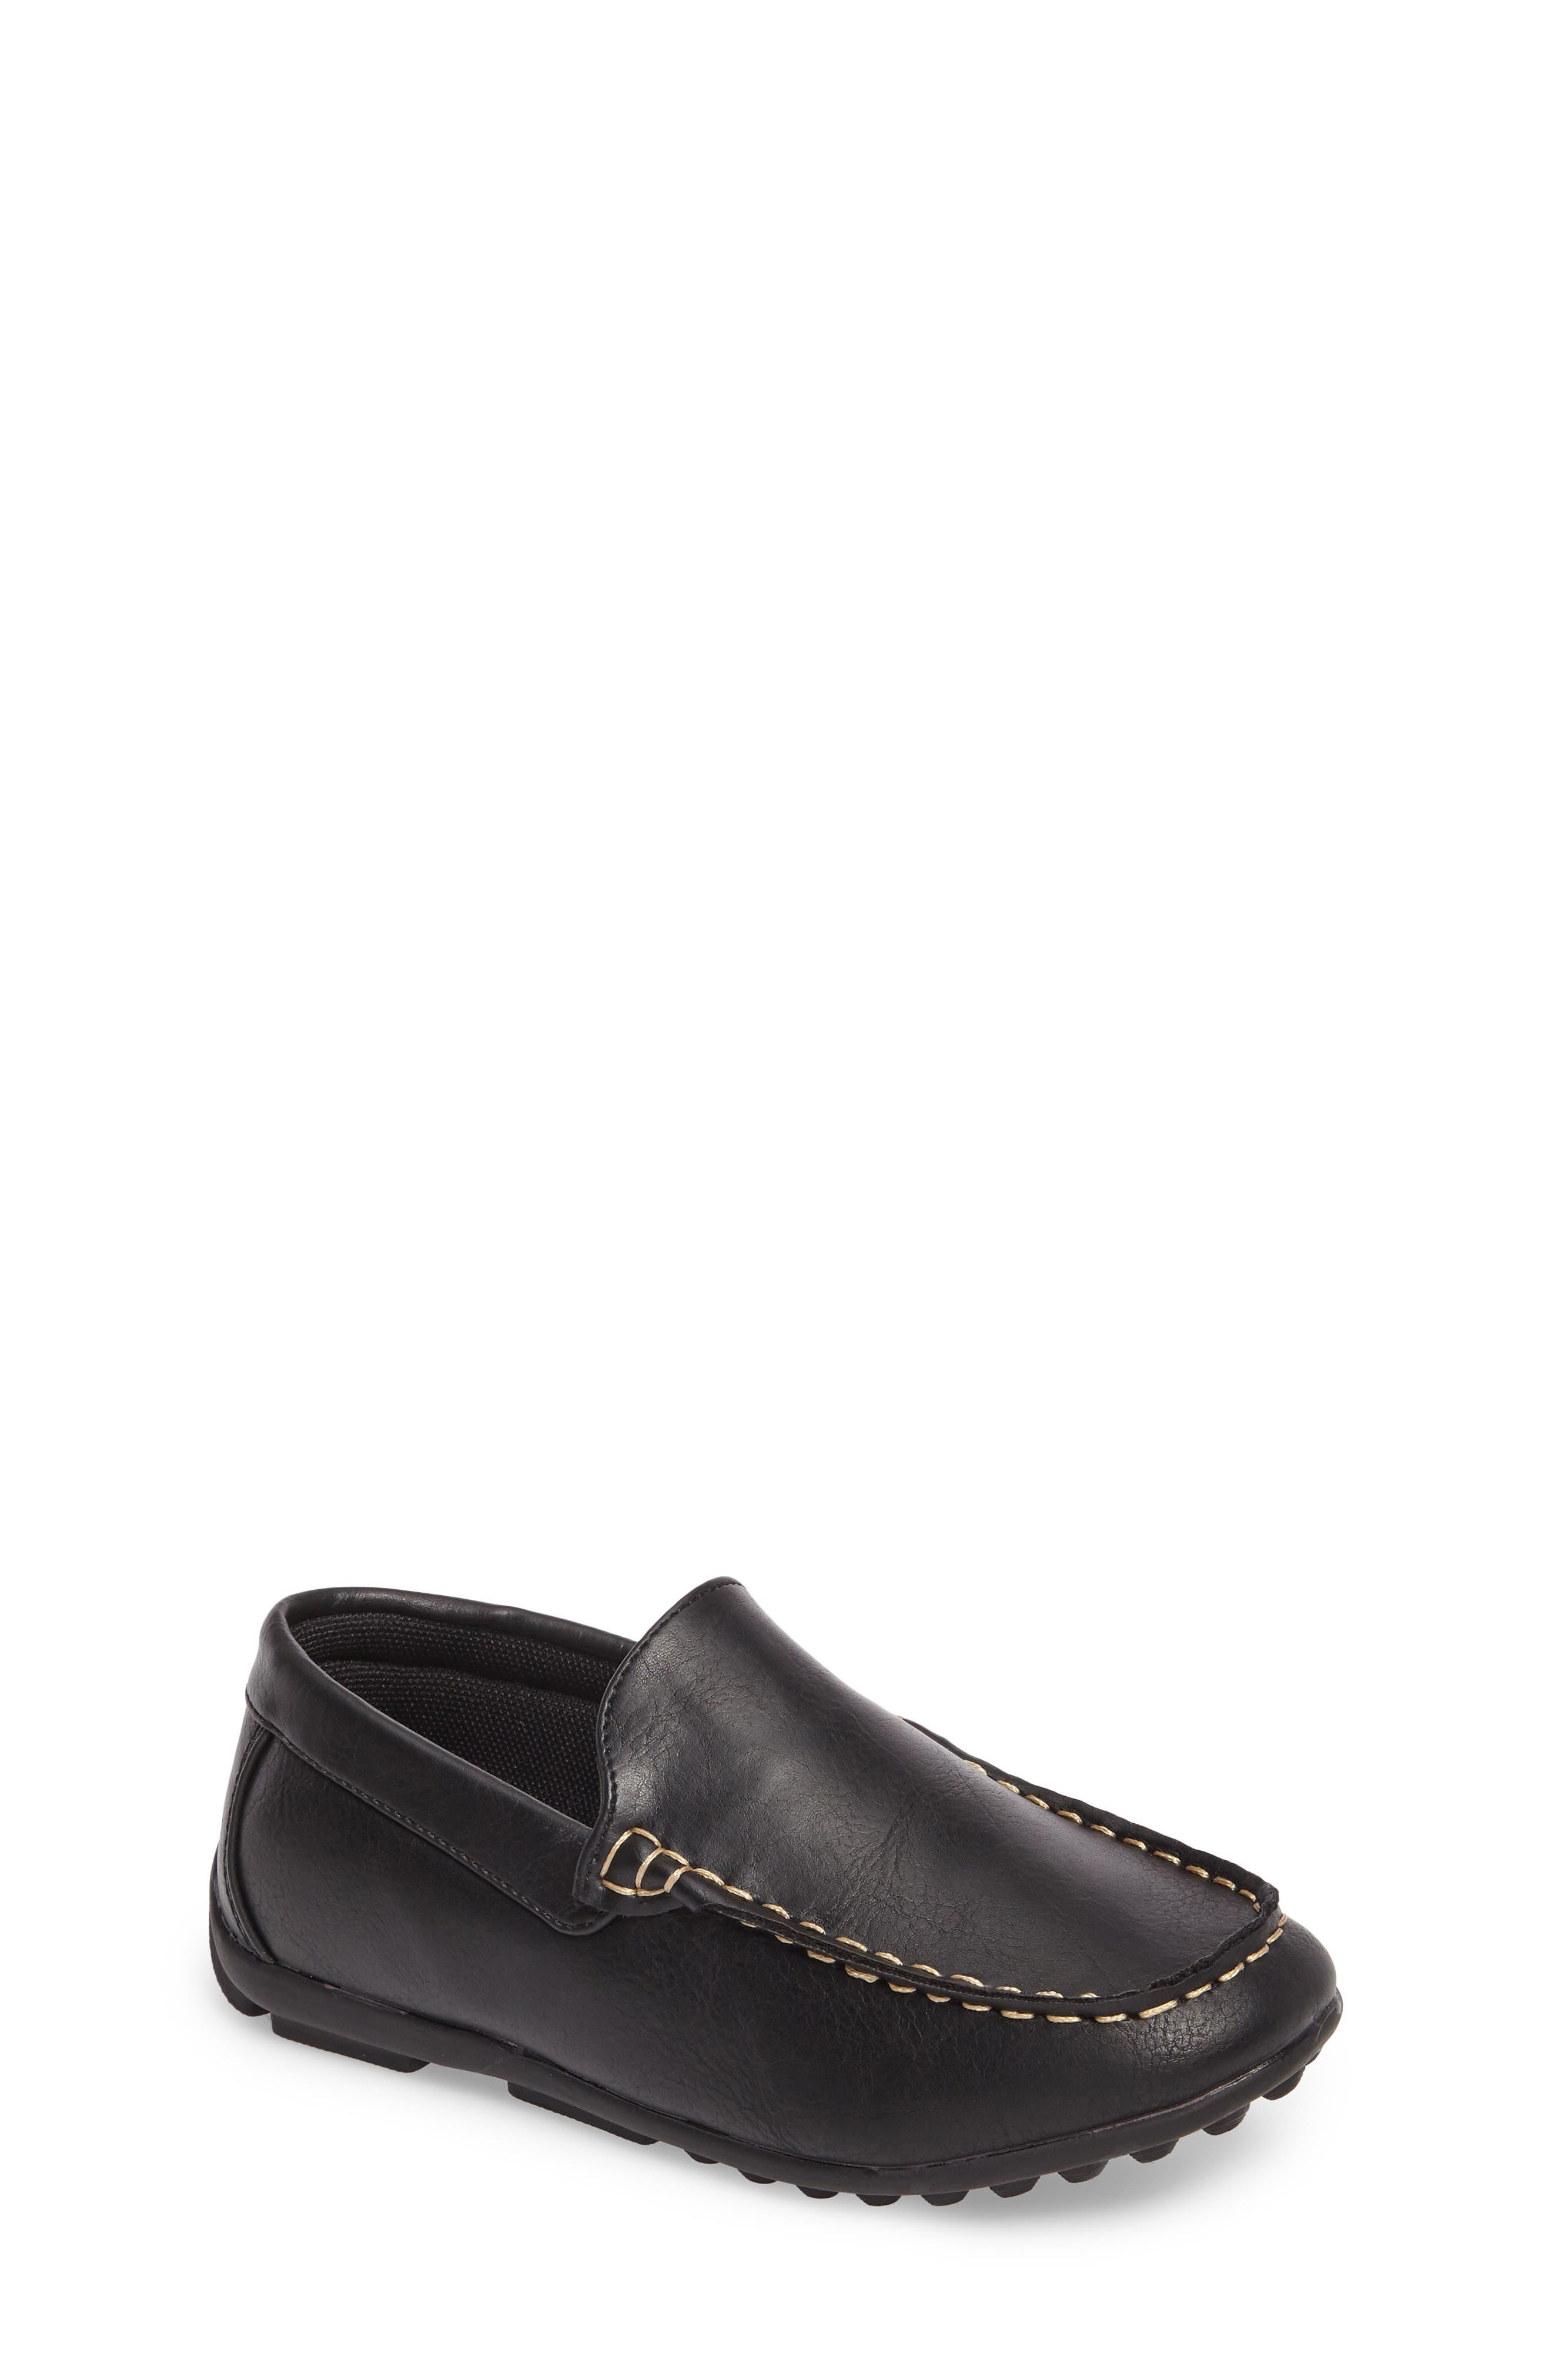 STEVE MADDEN Compton Driving Loafer, Main, color, BLACK